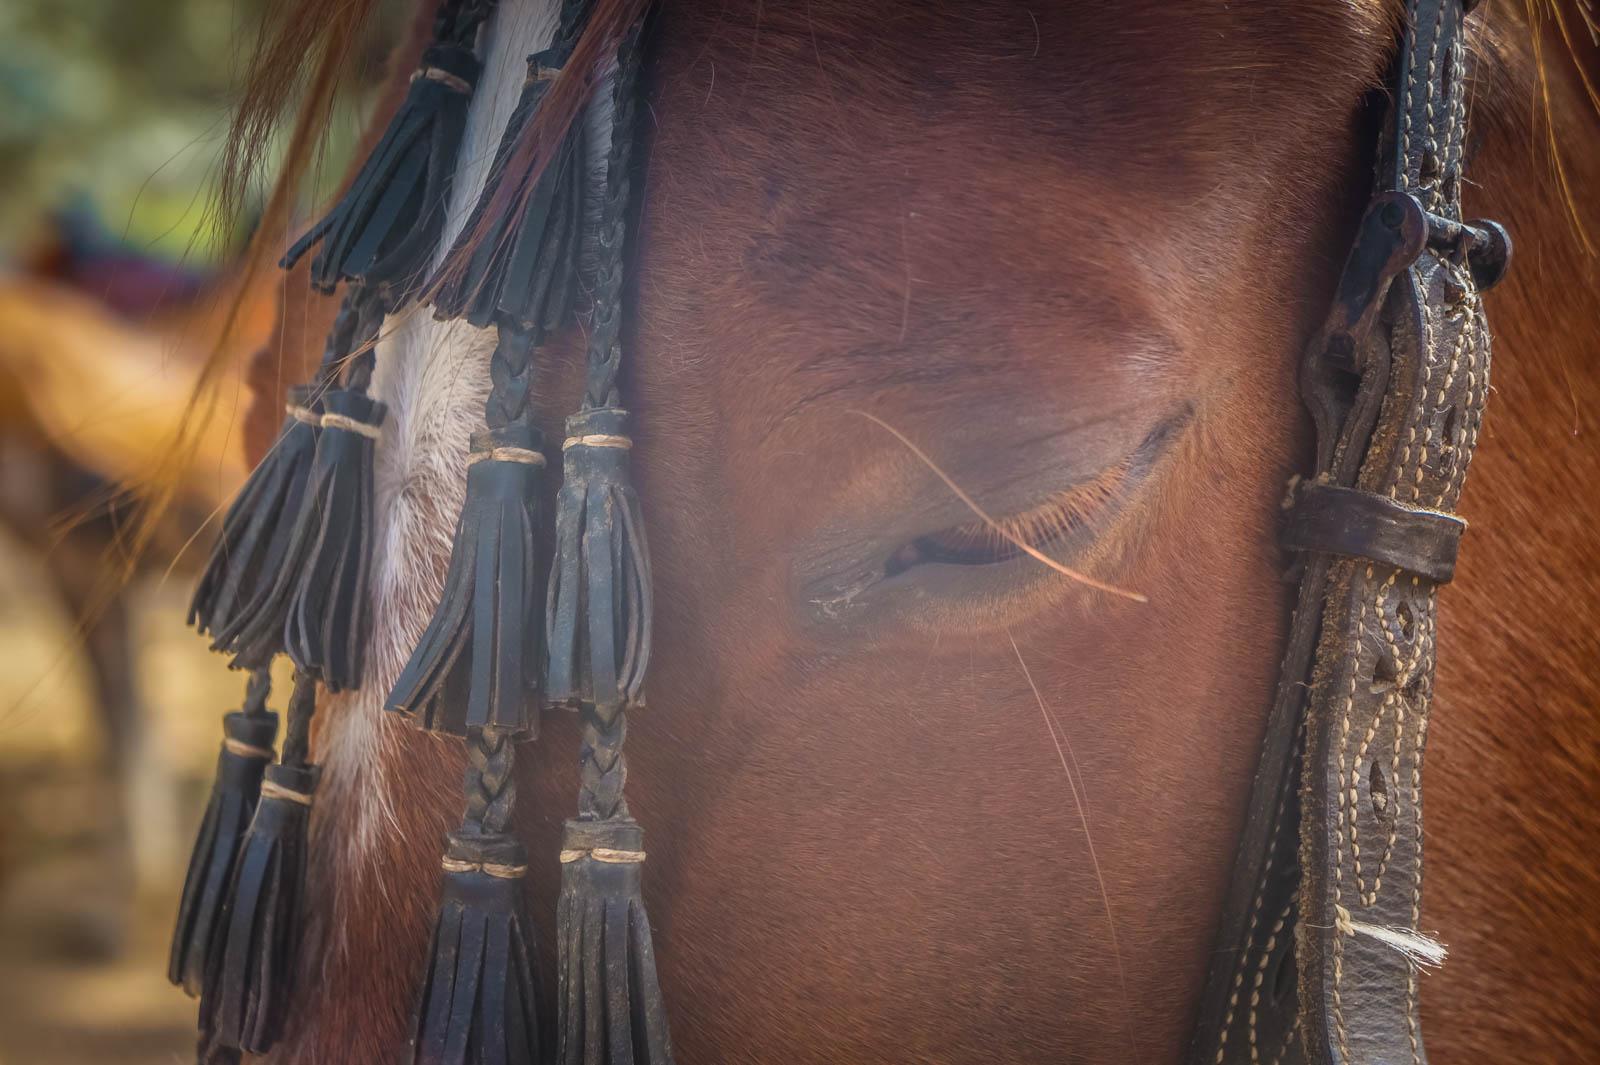 horseback-riding-pelion-greece-la-vie-en-blog-all-rights-reserved-10